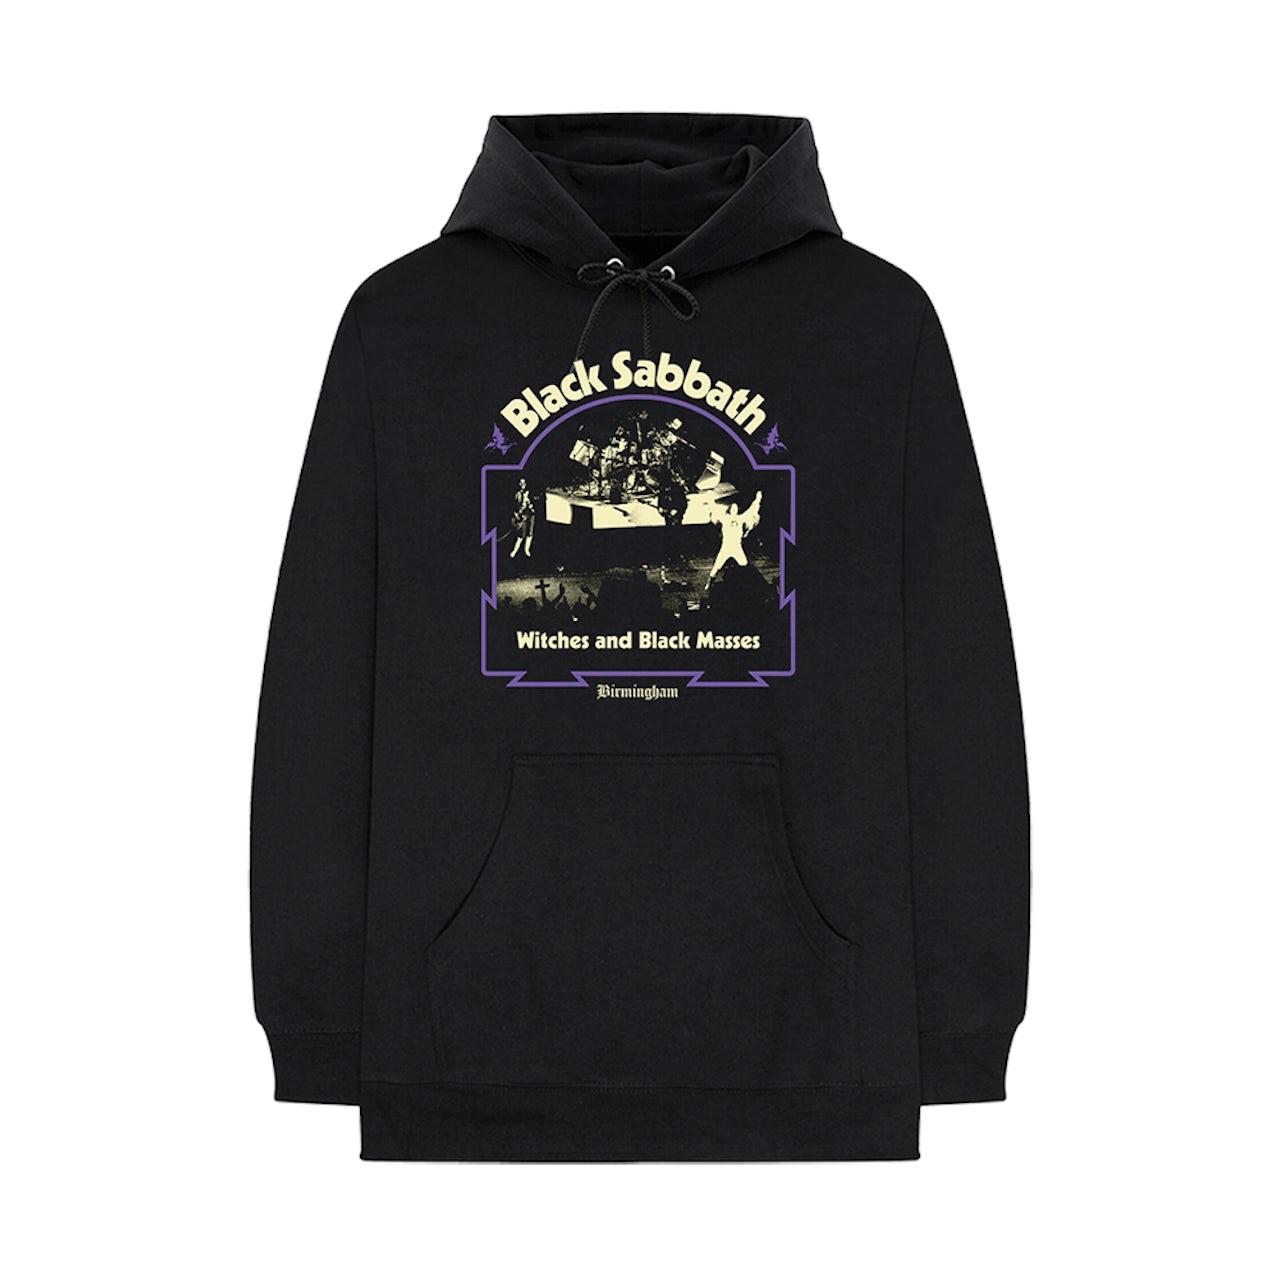 Black Sabbath Christmas Sweater.Black Sabbath Witches And Black Masses Hoodie